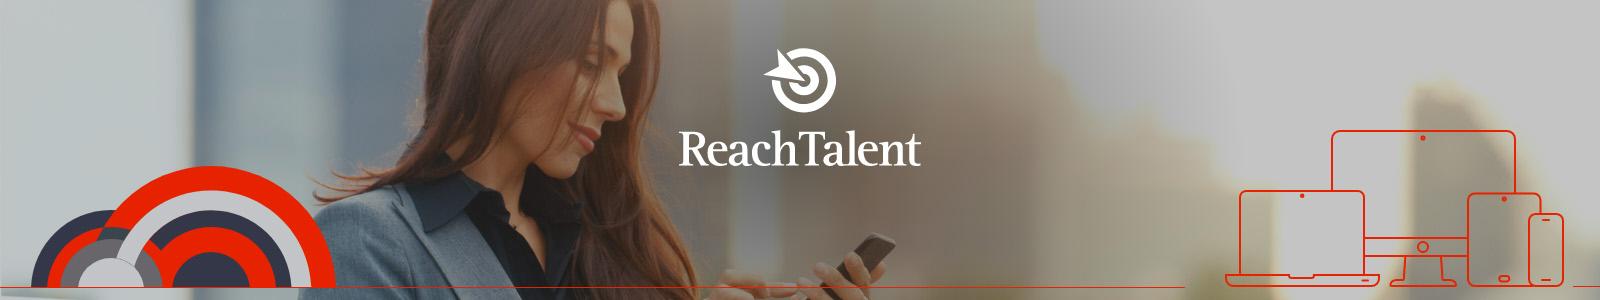 Reach Talent main banner